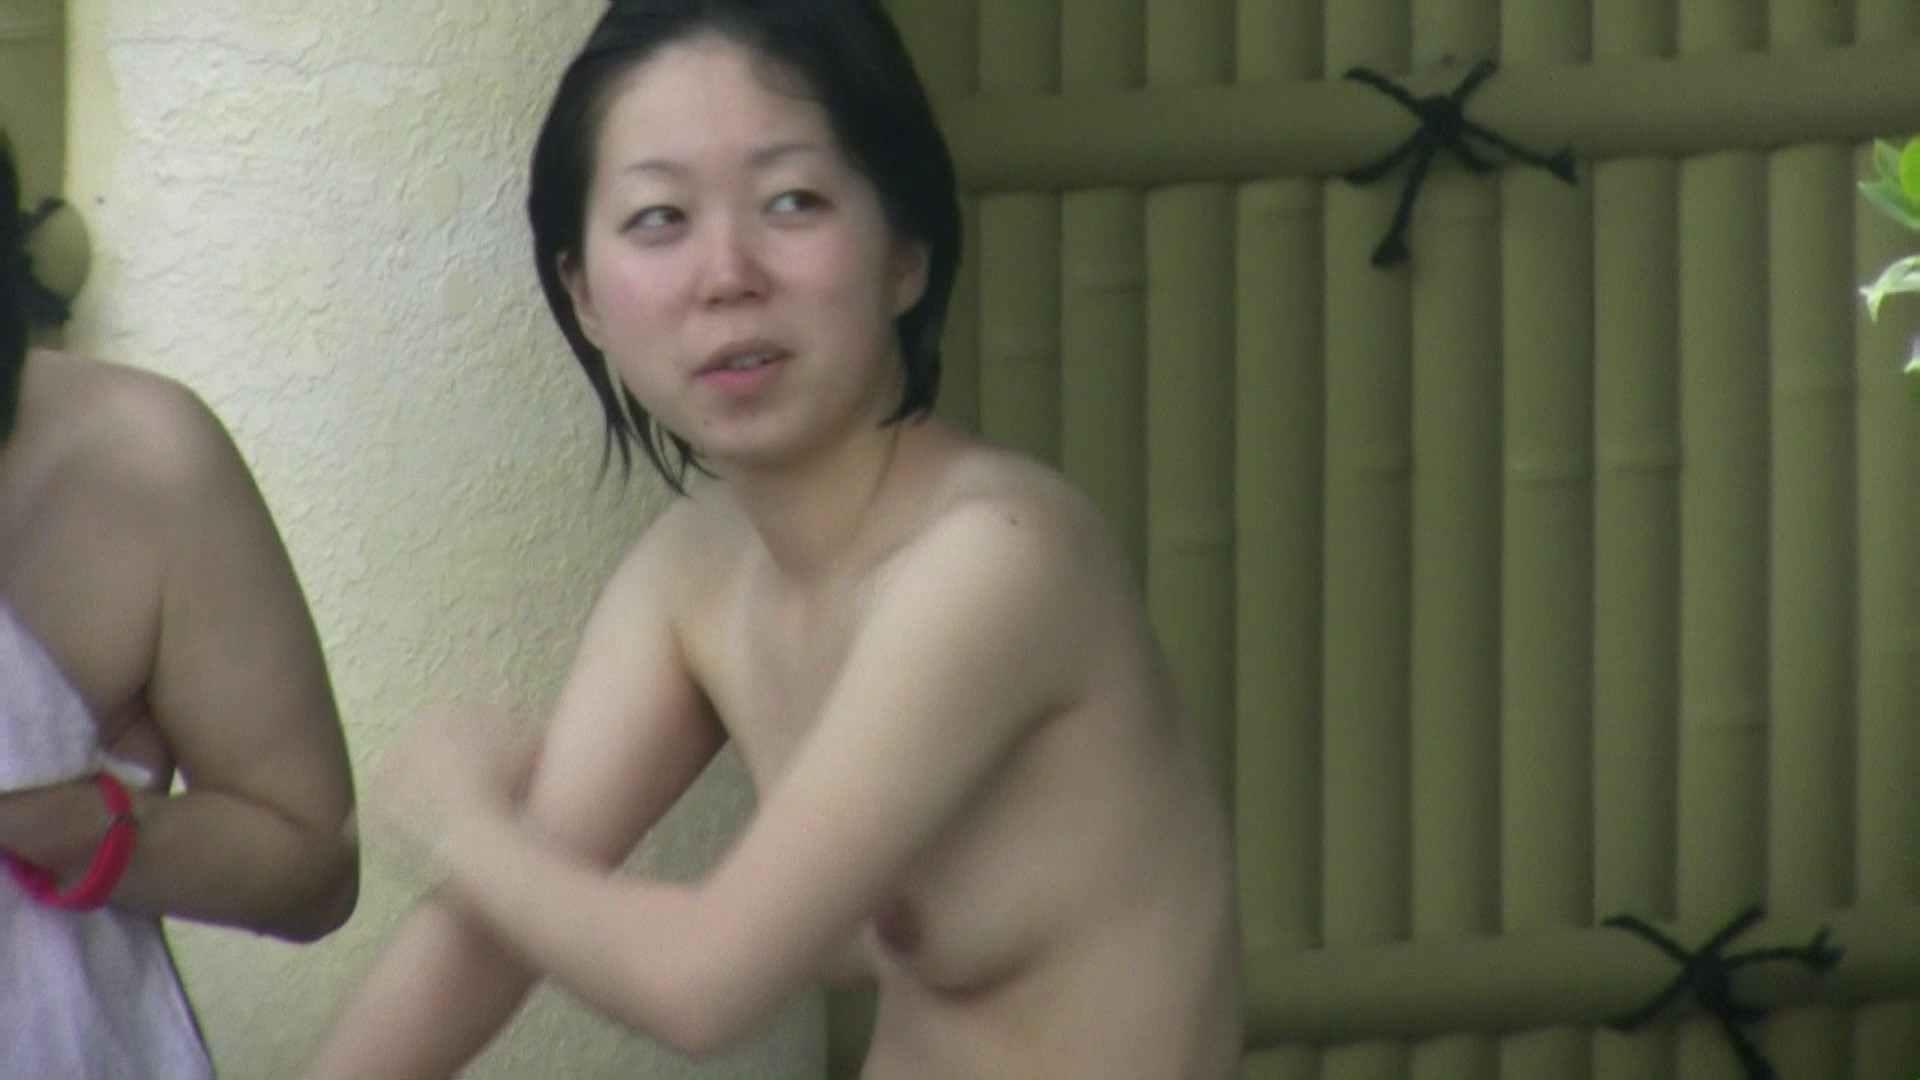 Aquaな露天風呂Vol.06【VIP】 露天 オマンコ無修正動画無料 113PICs 101